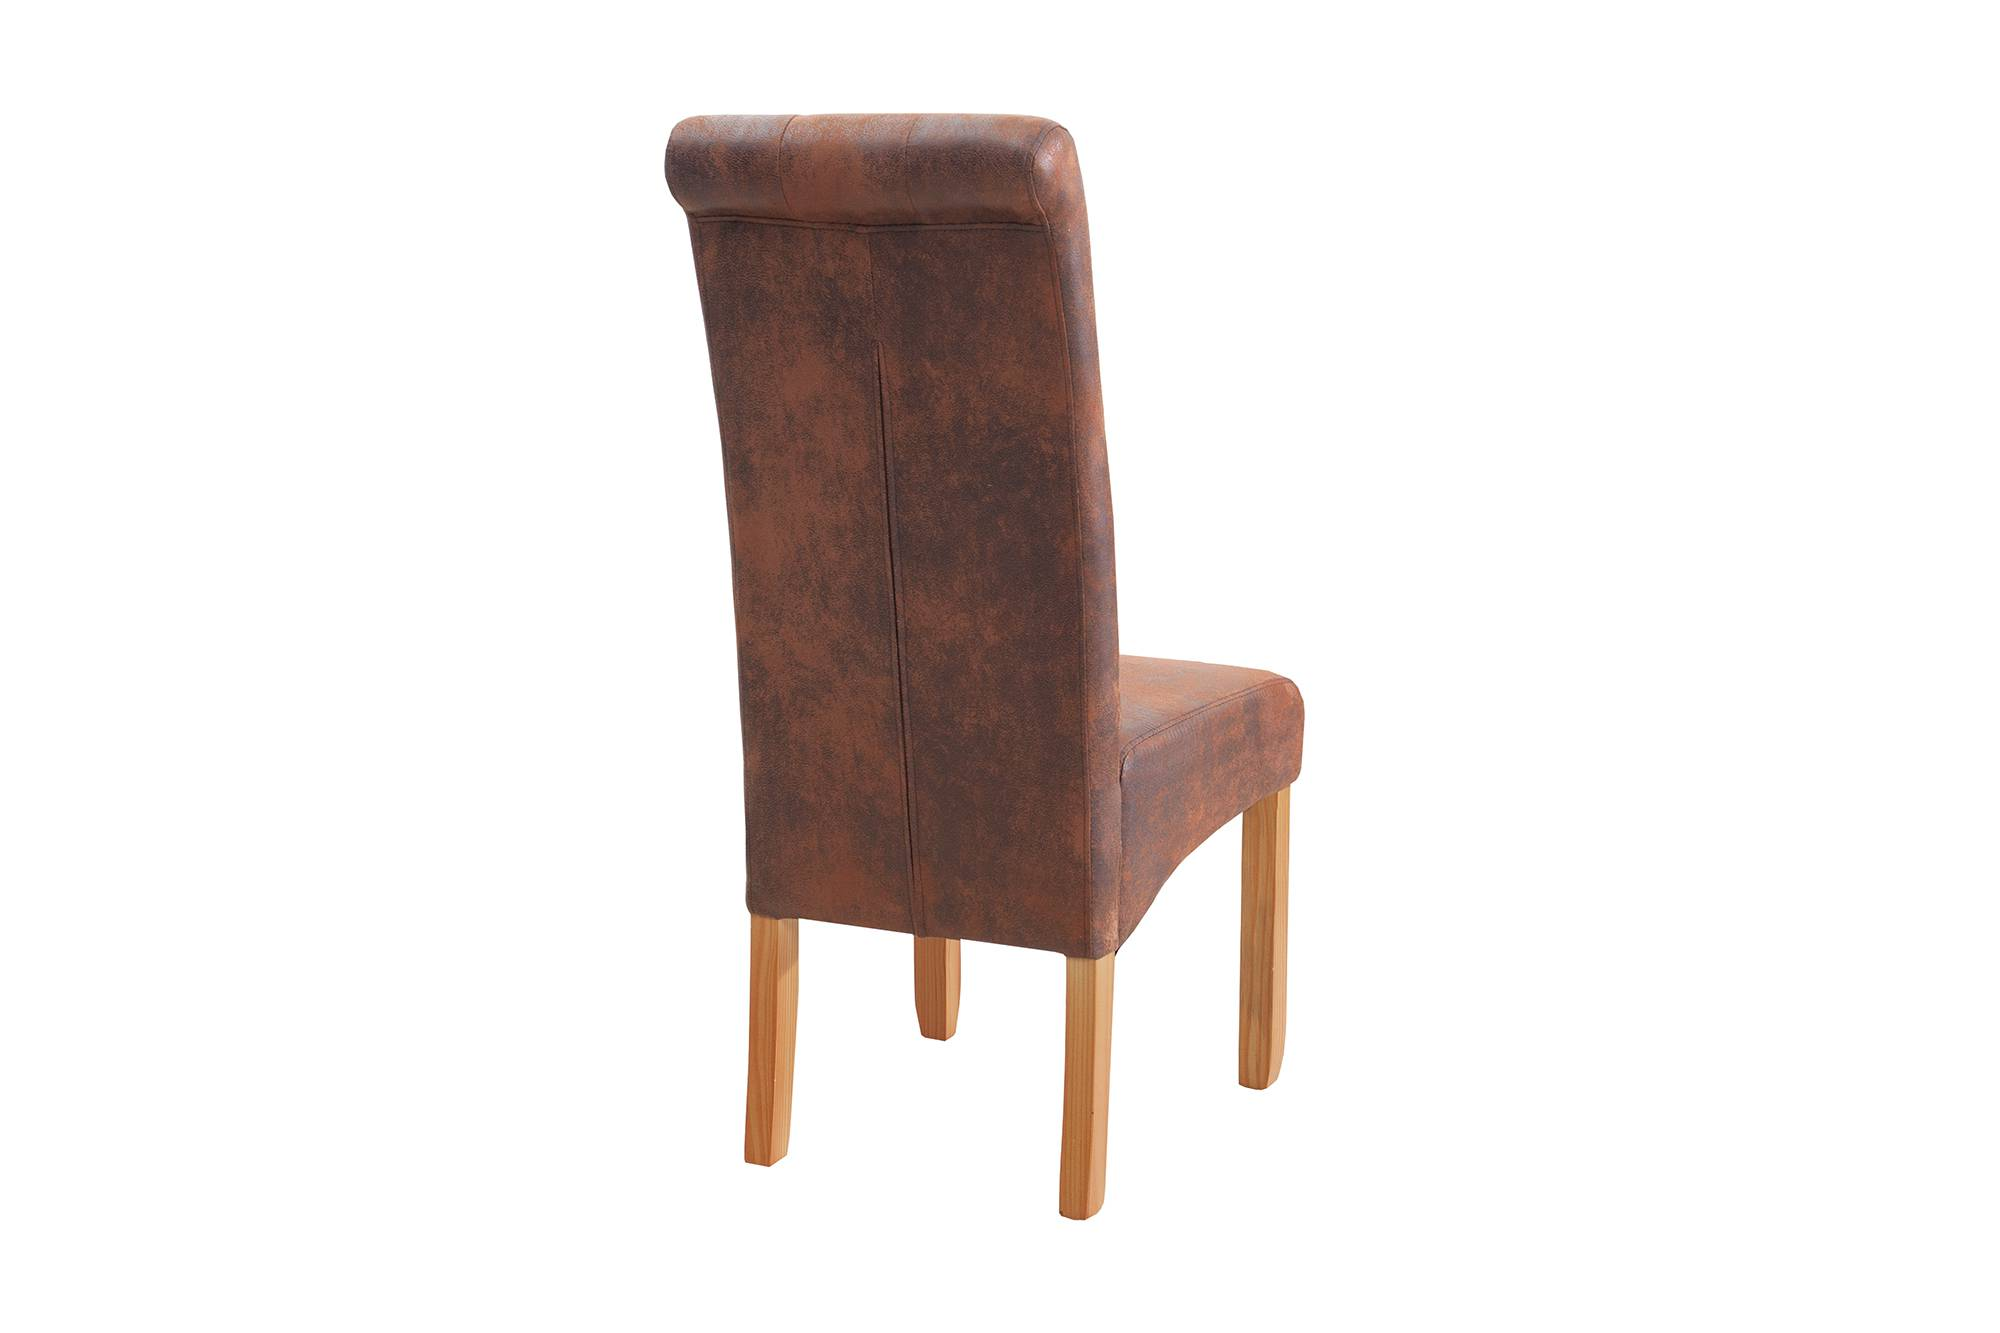 Židle Clemente whisky hnědá